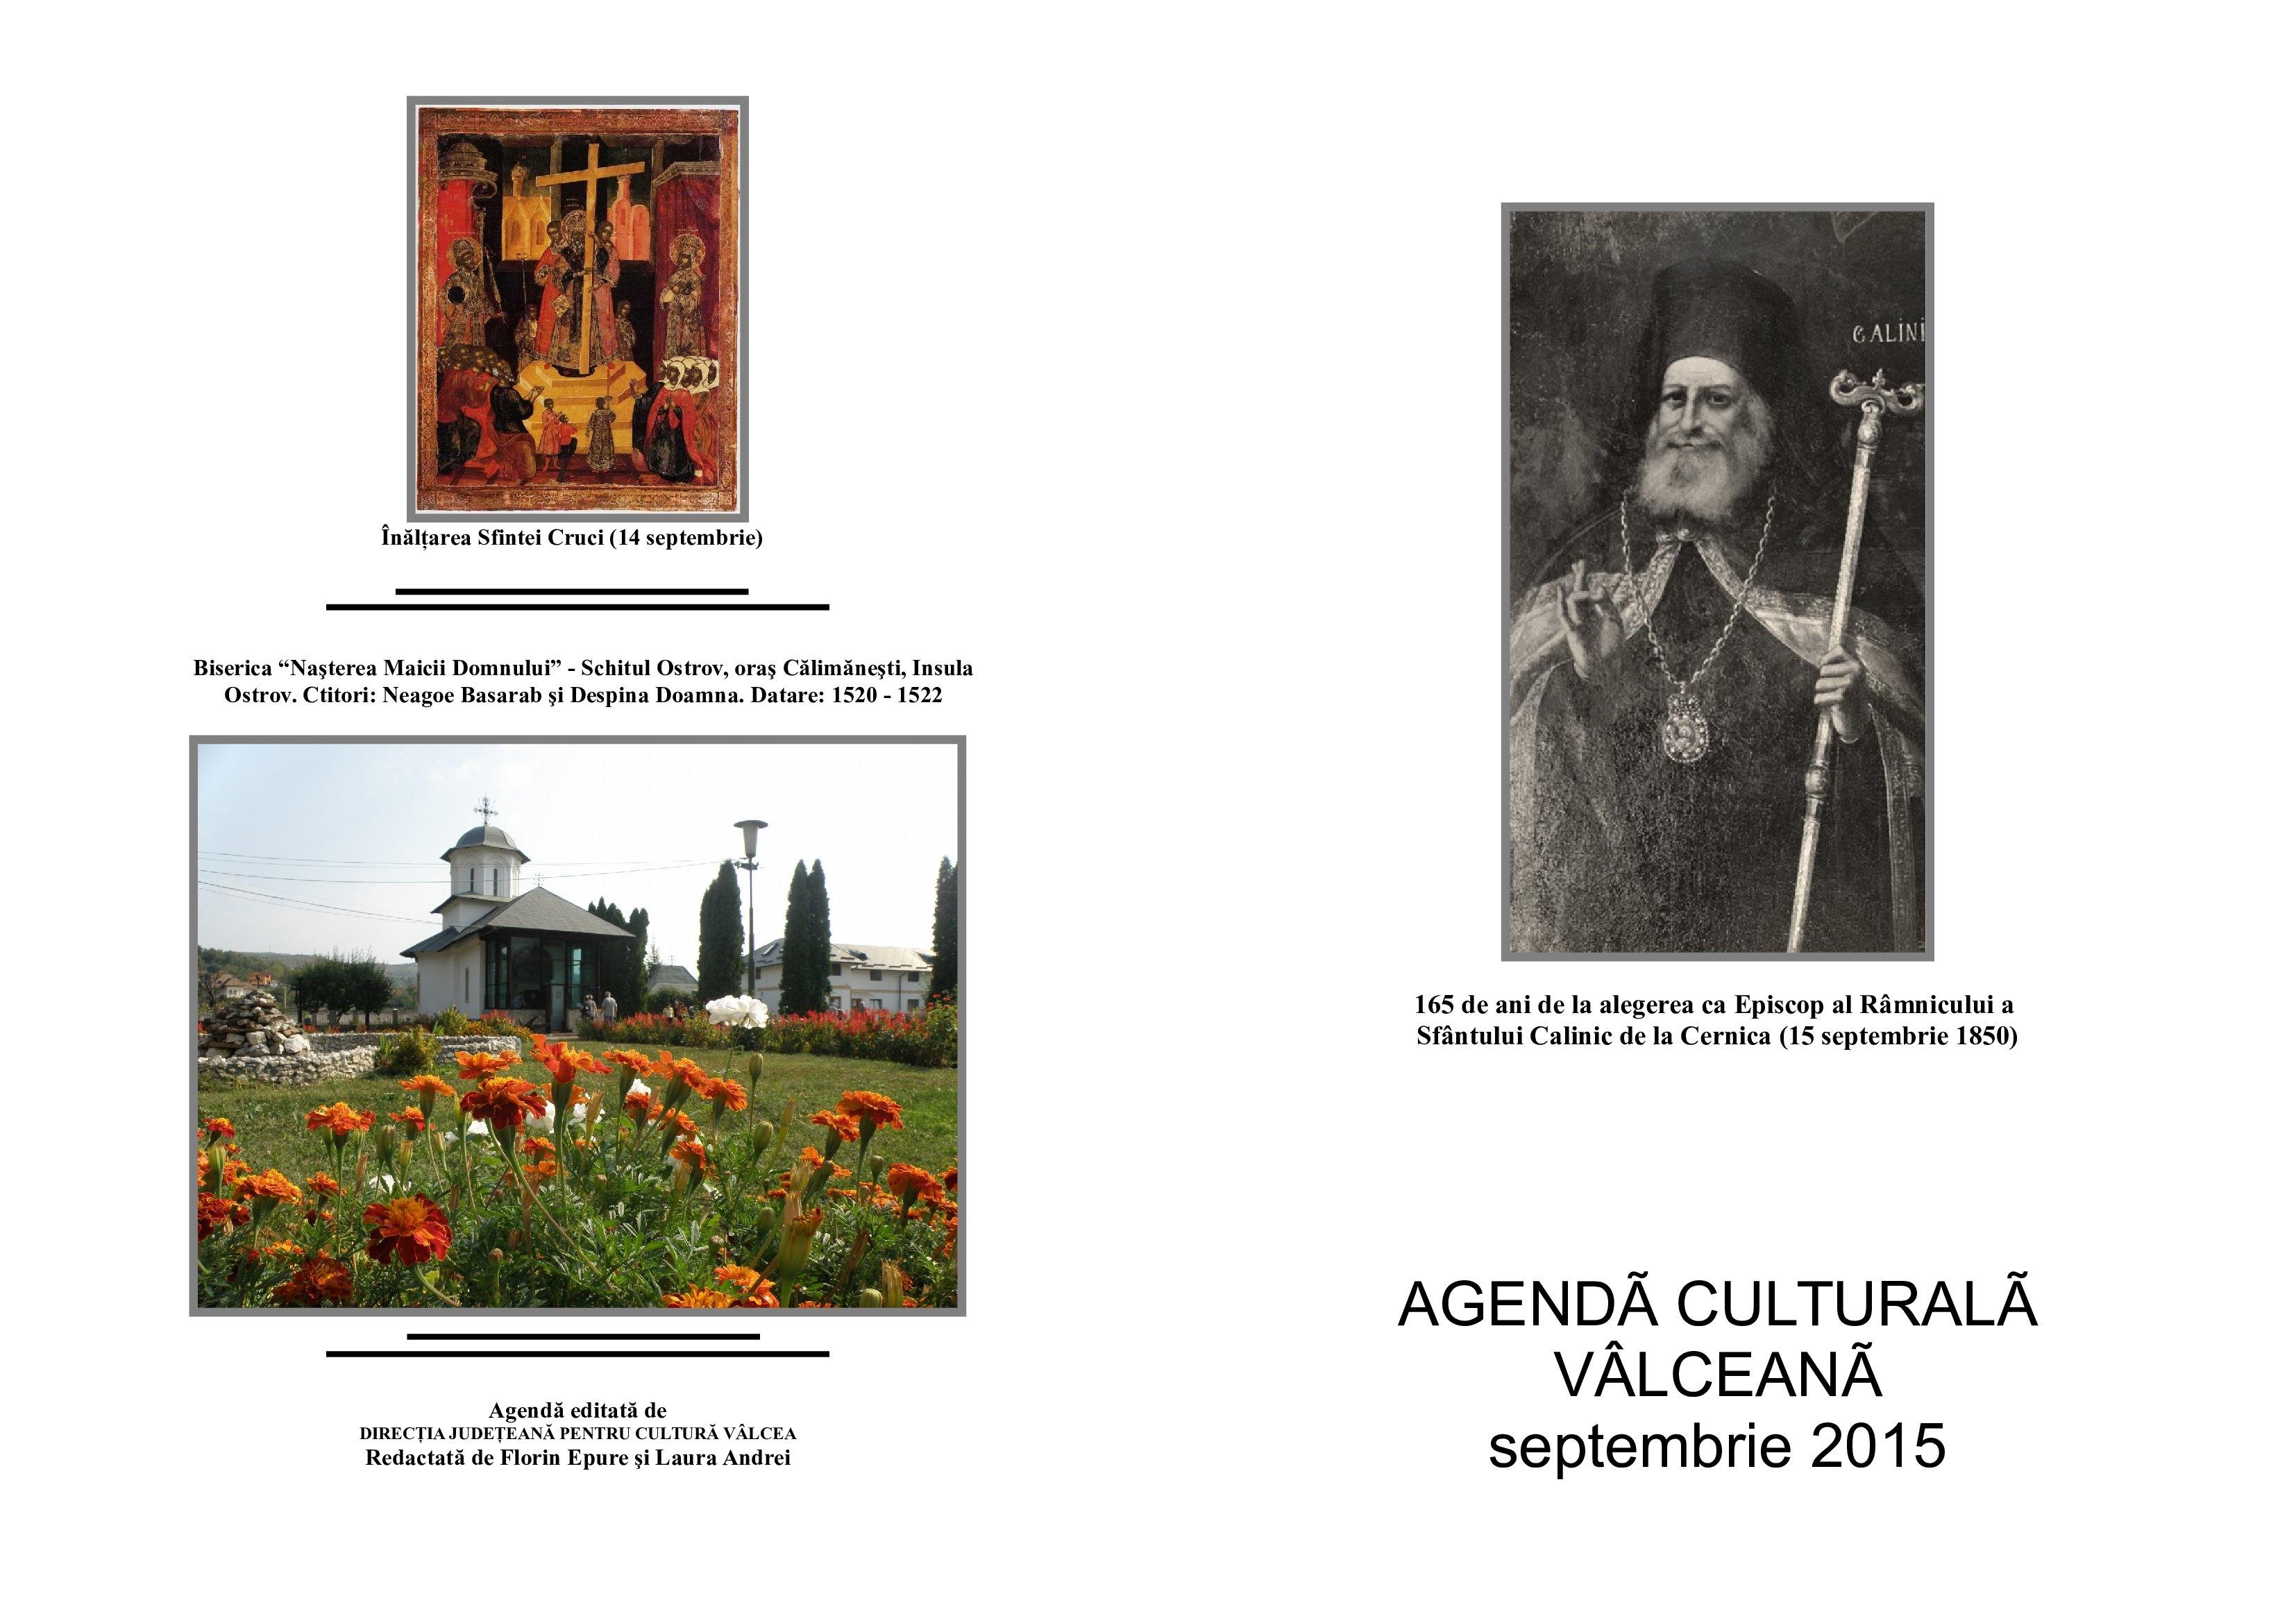 Agenda Culturala Valceana, septembrie 2015